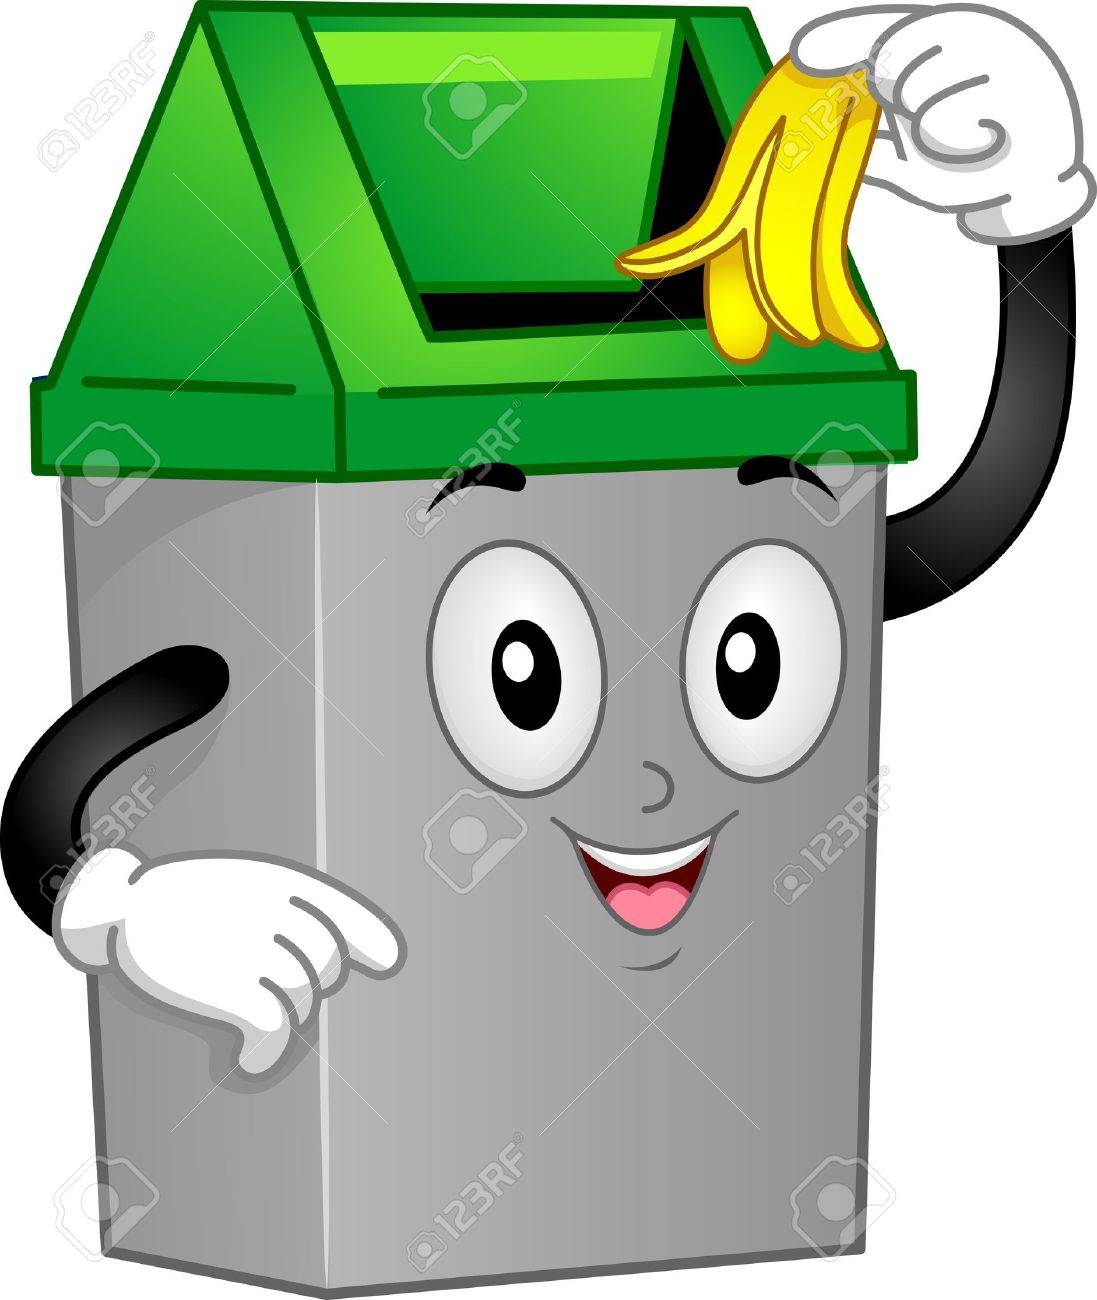 Mascot Illustration Featuring a Trash Can Discarding a Banana Peel Stock Illustration - 15957540